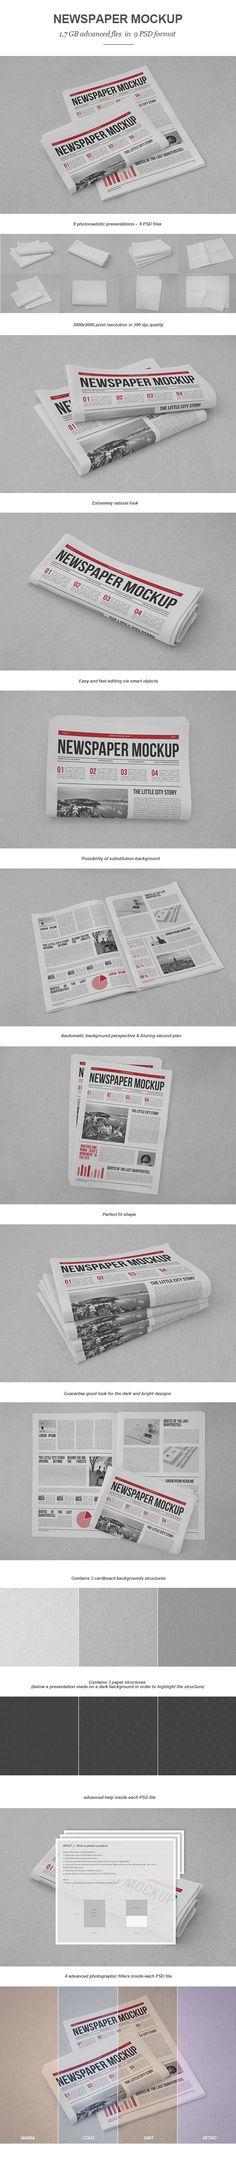 Newspaper Mock-up - Print Mockup Template by Newspaper Layout, Newspaper Design, Newspaper Paper, Mockup Photoshop, Branding, Brochure Design, Editorial Design, Layout Design, Design Elements